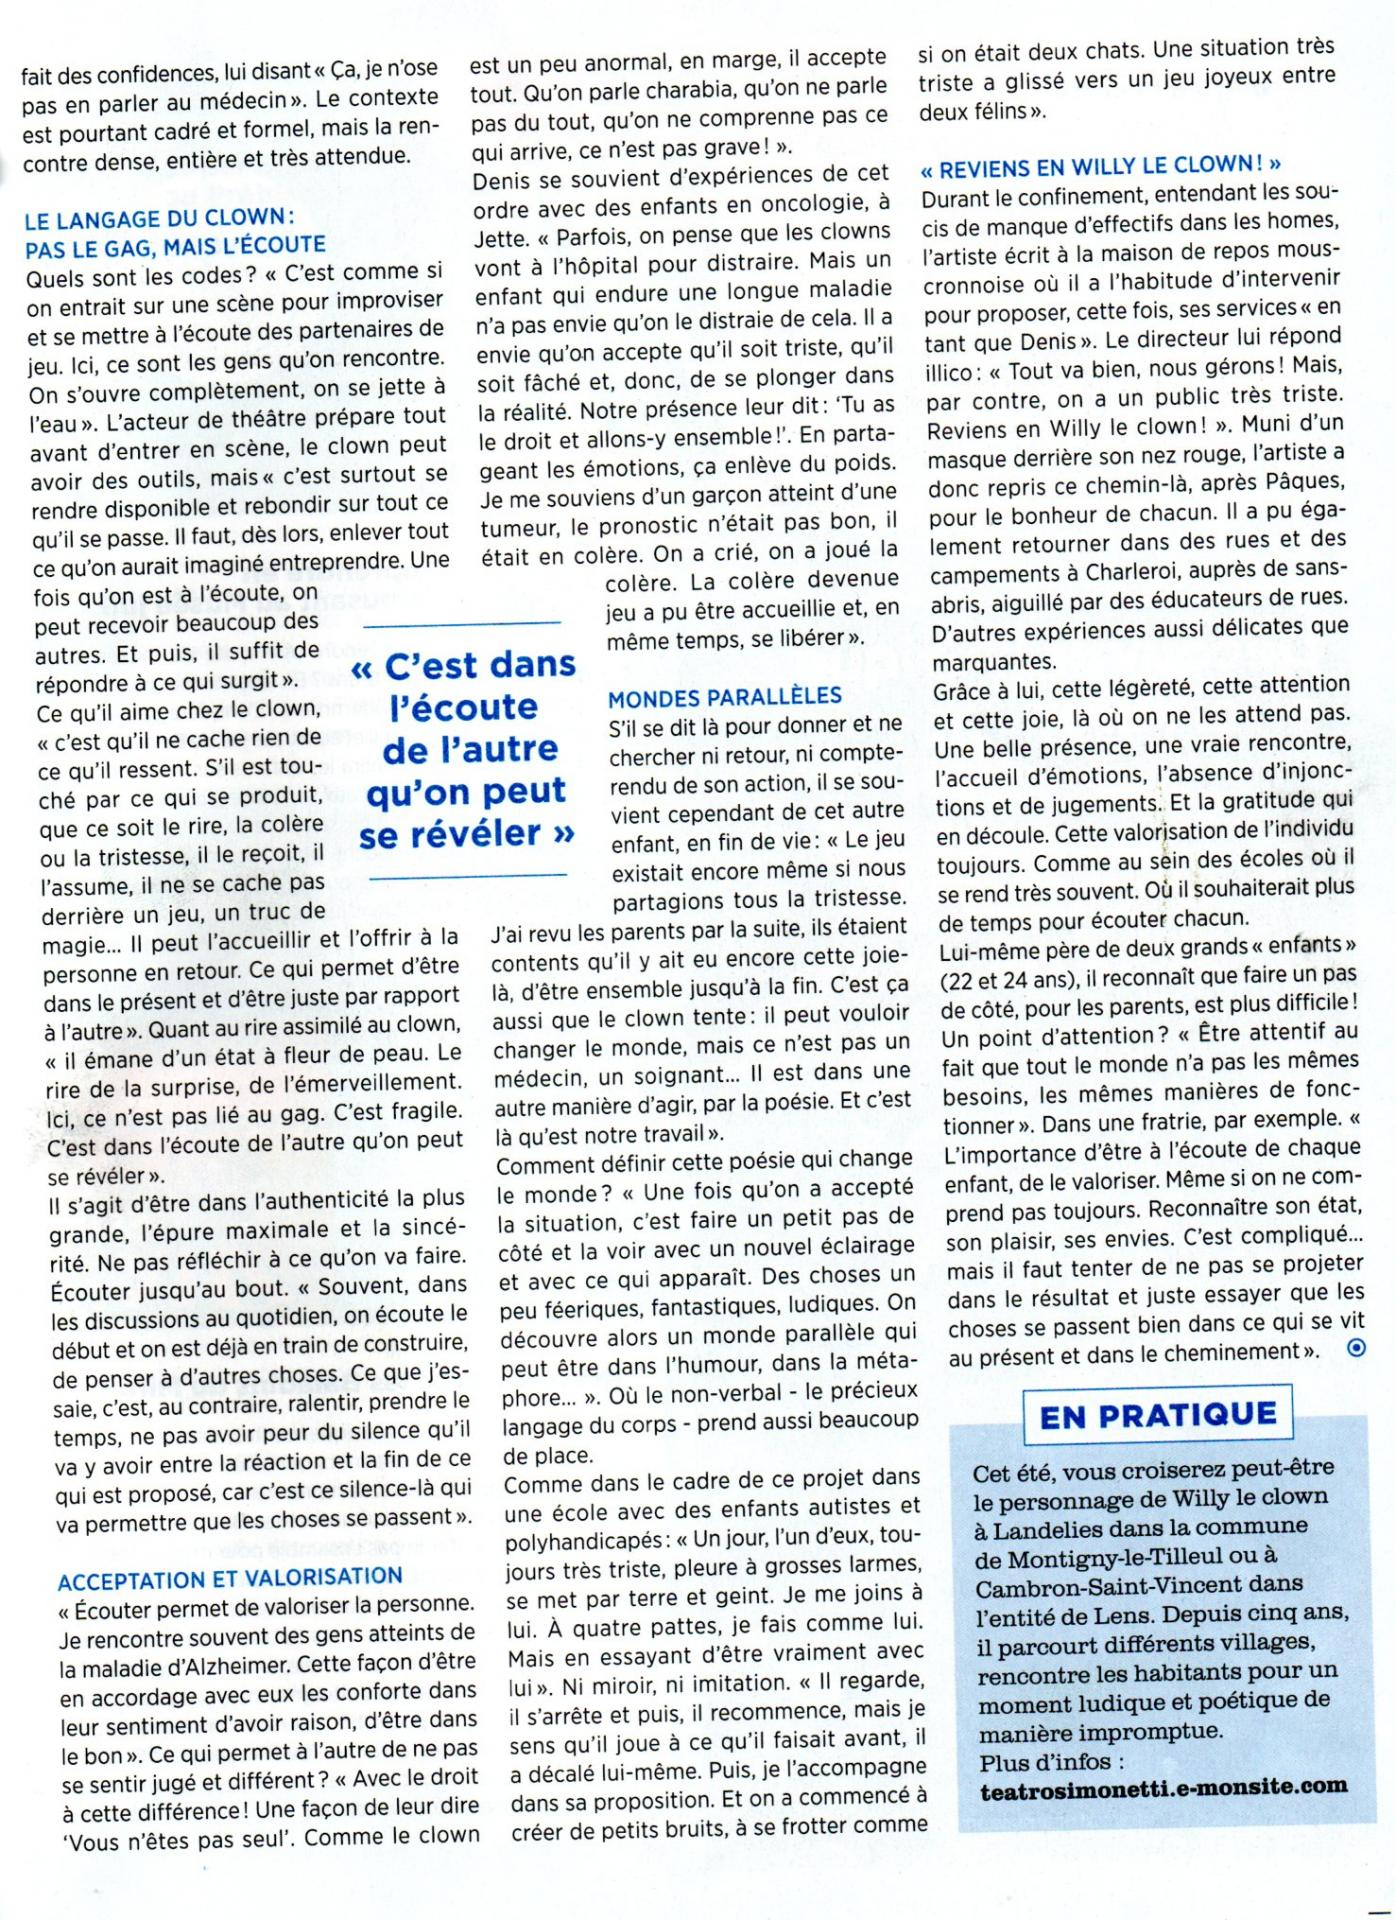 Ligueur 24 06 2020 2